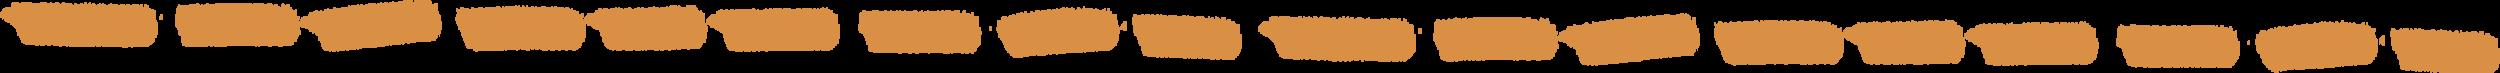 dashed-line-graphic-orange.png